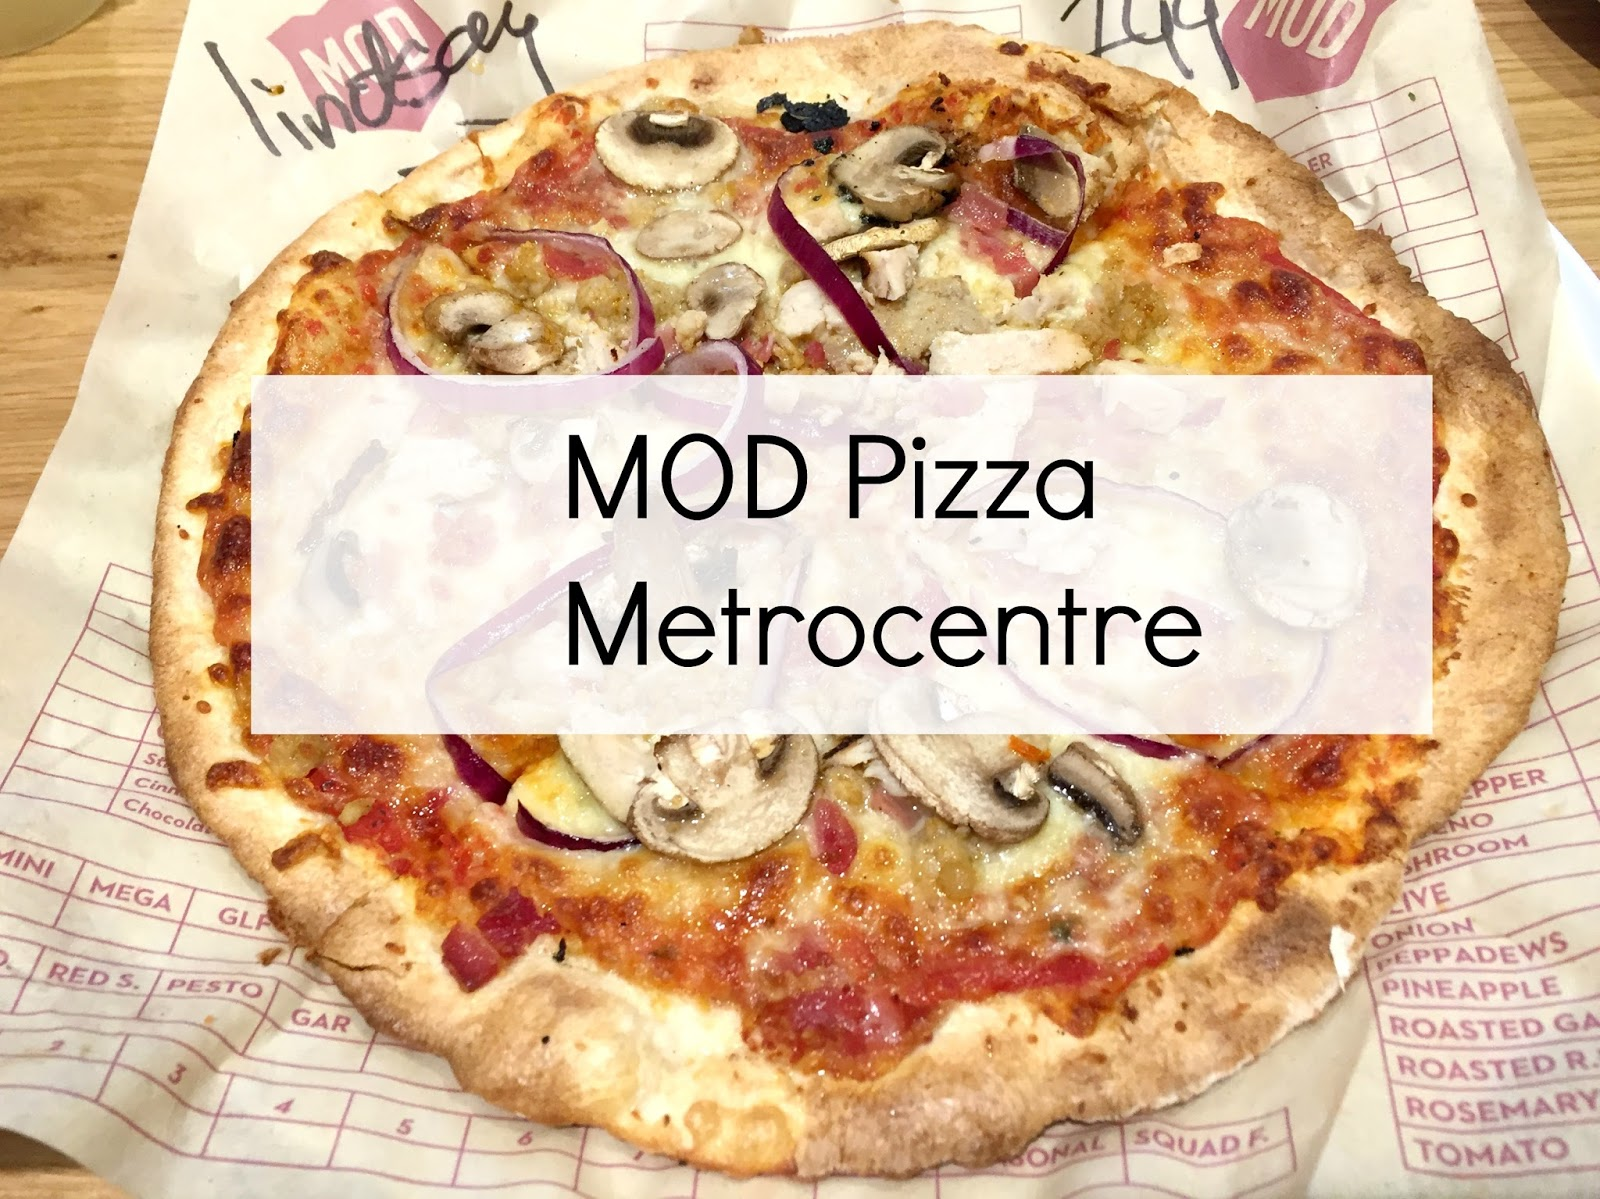 Mod pizza coupon code